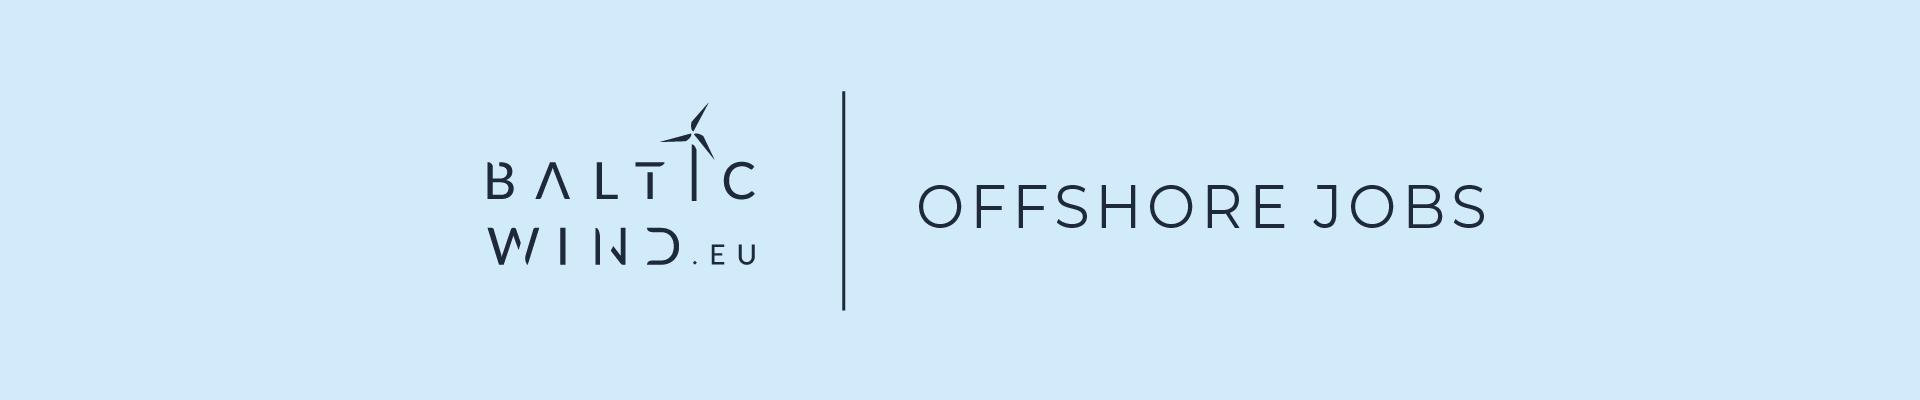 Baltic Wind Offshore Jobs header logo